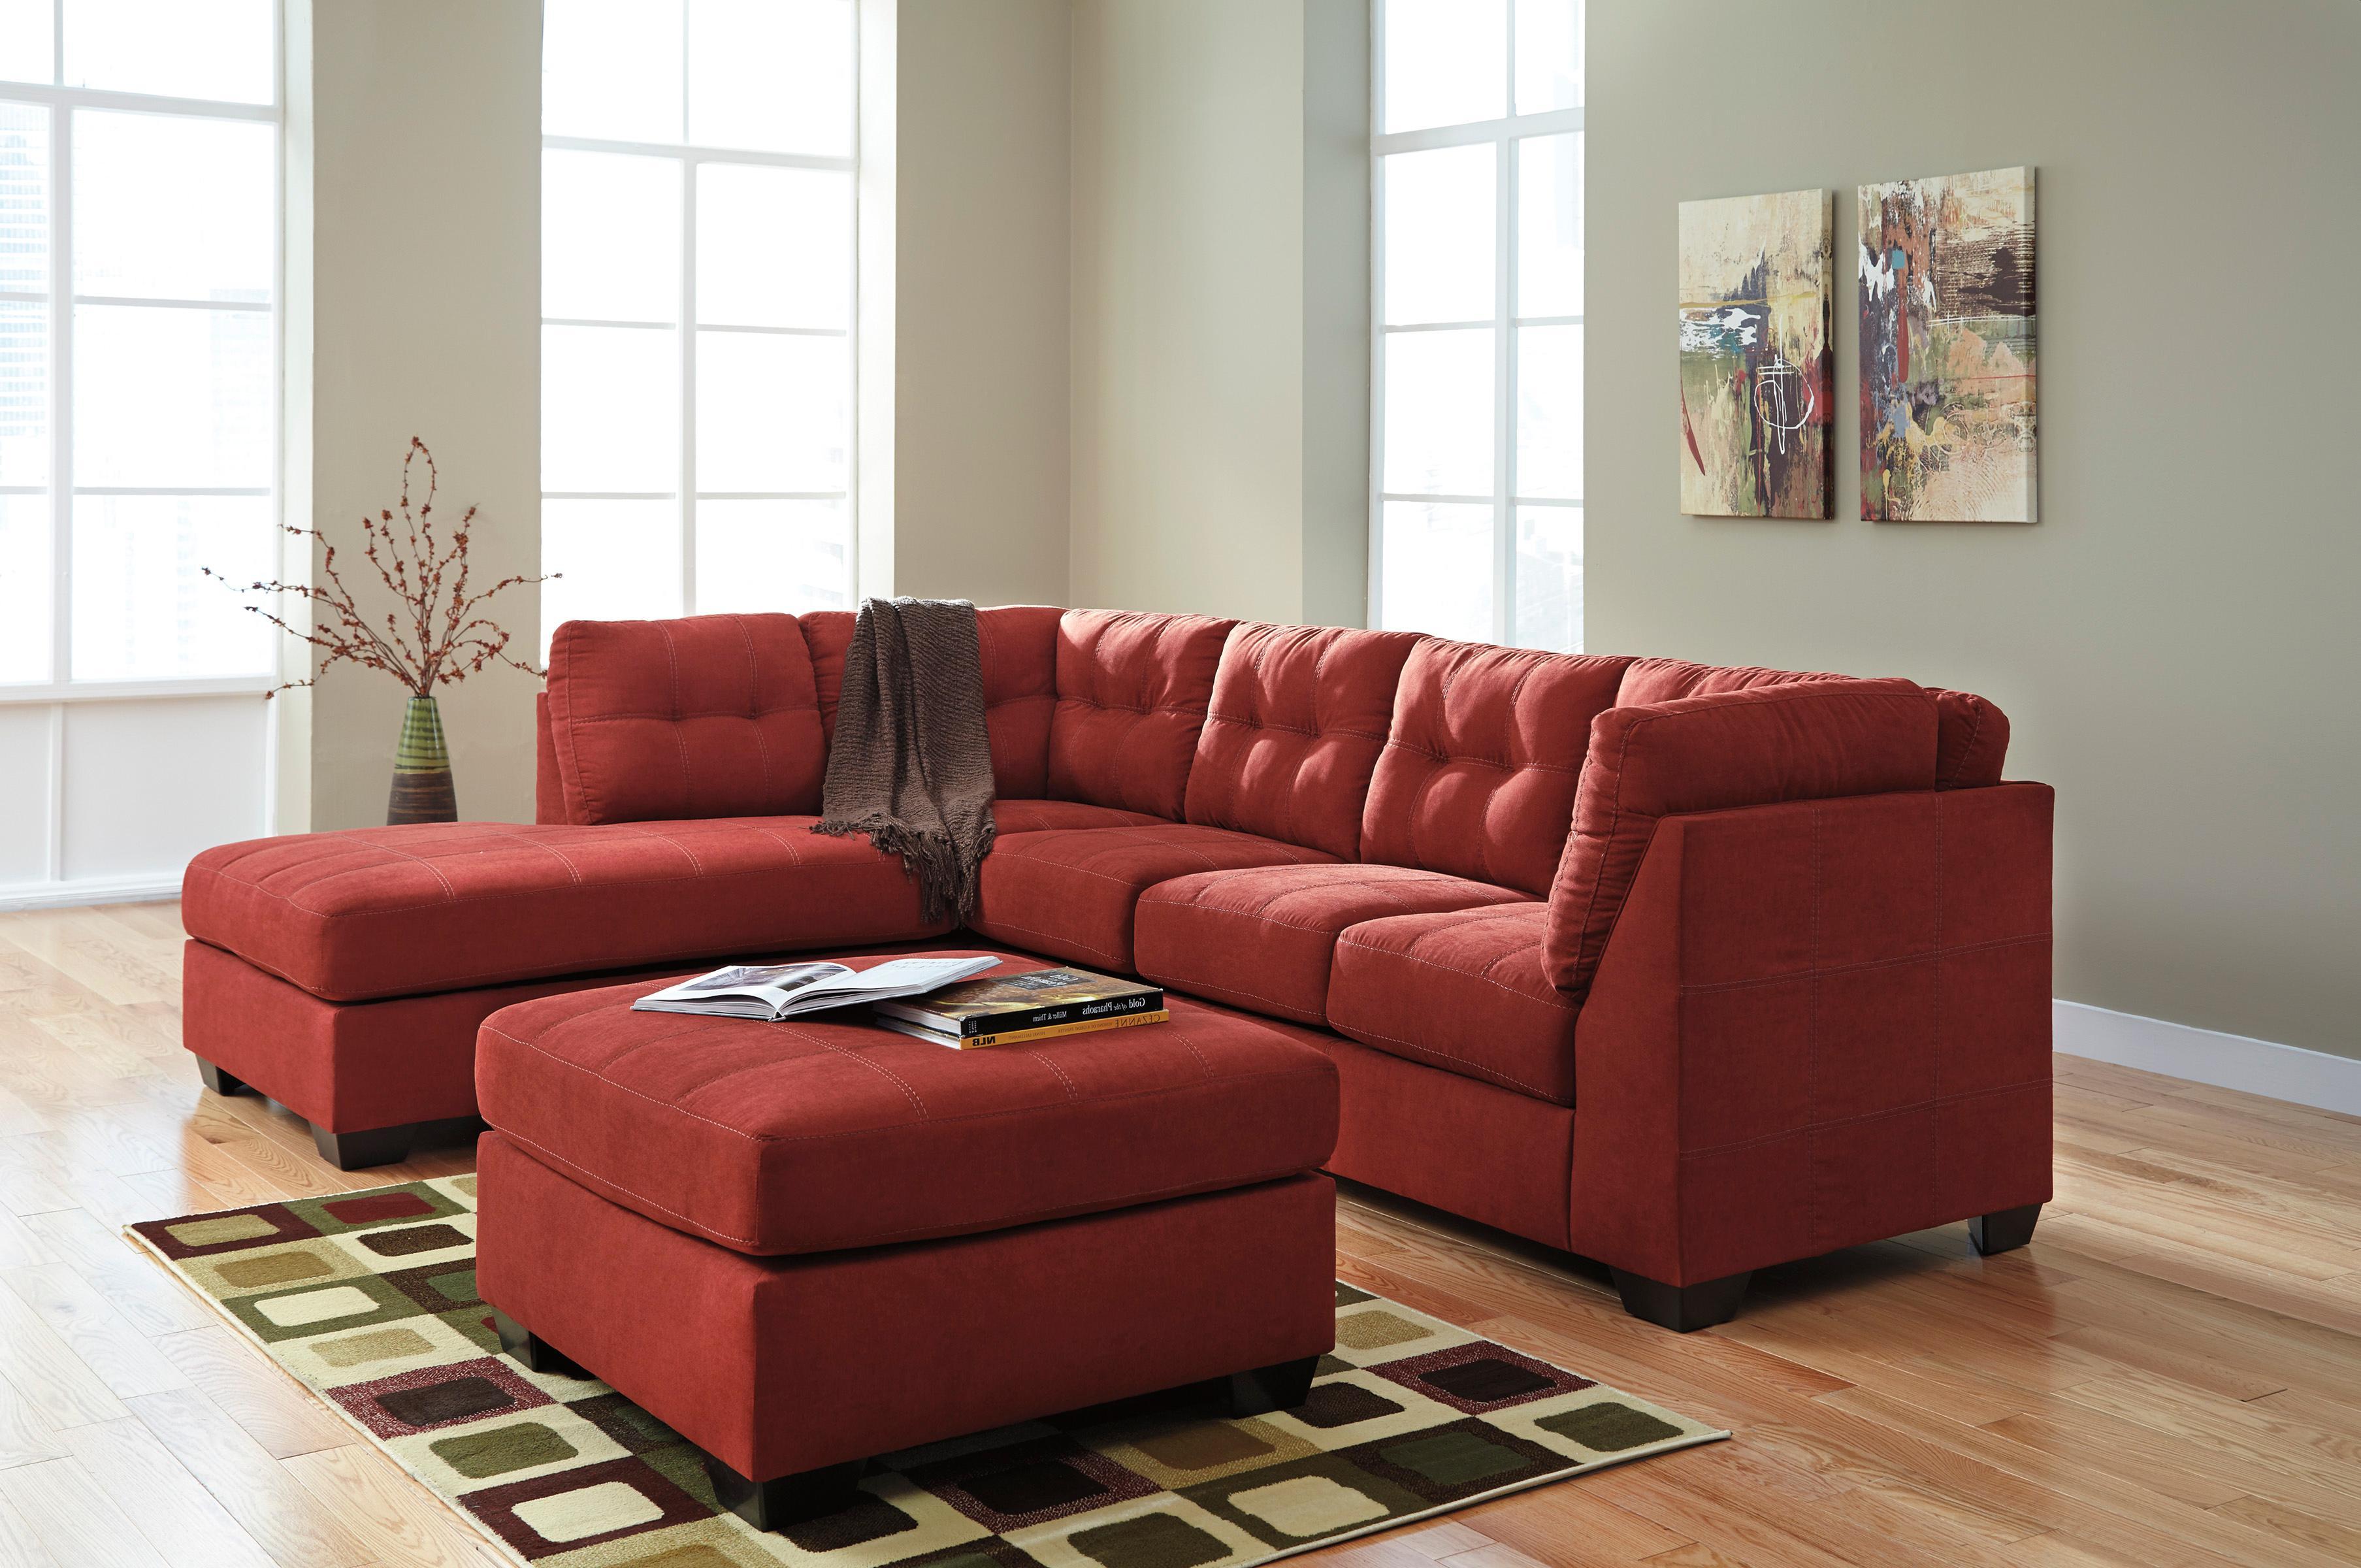 sienna sofa sleeper braxton sectional reviews benchcraft maier 2 piece w